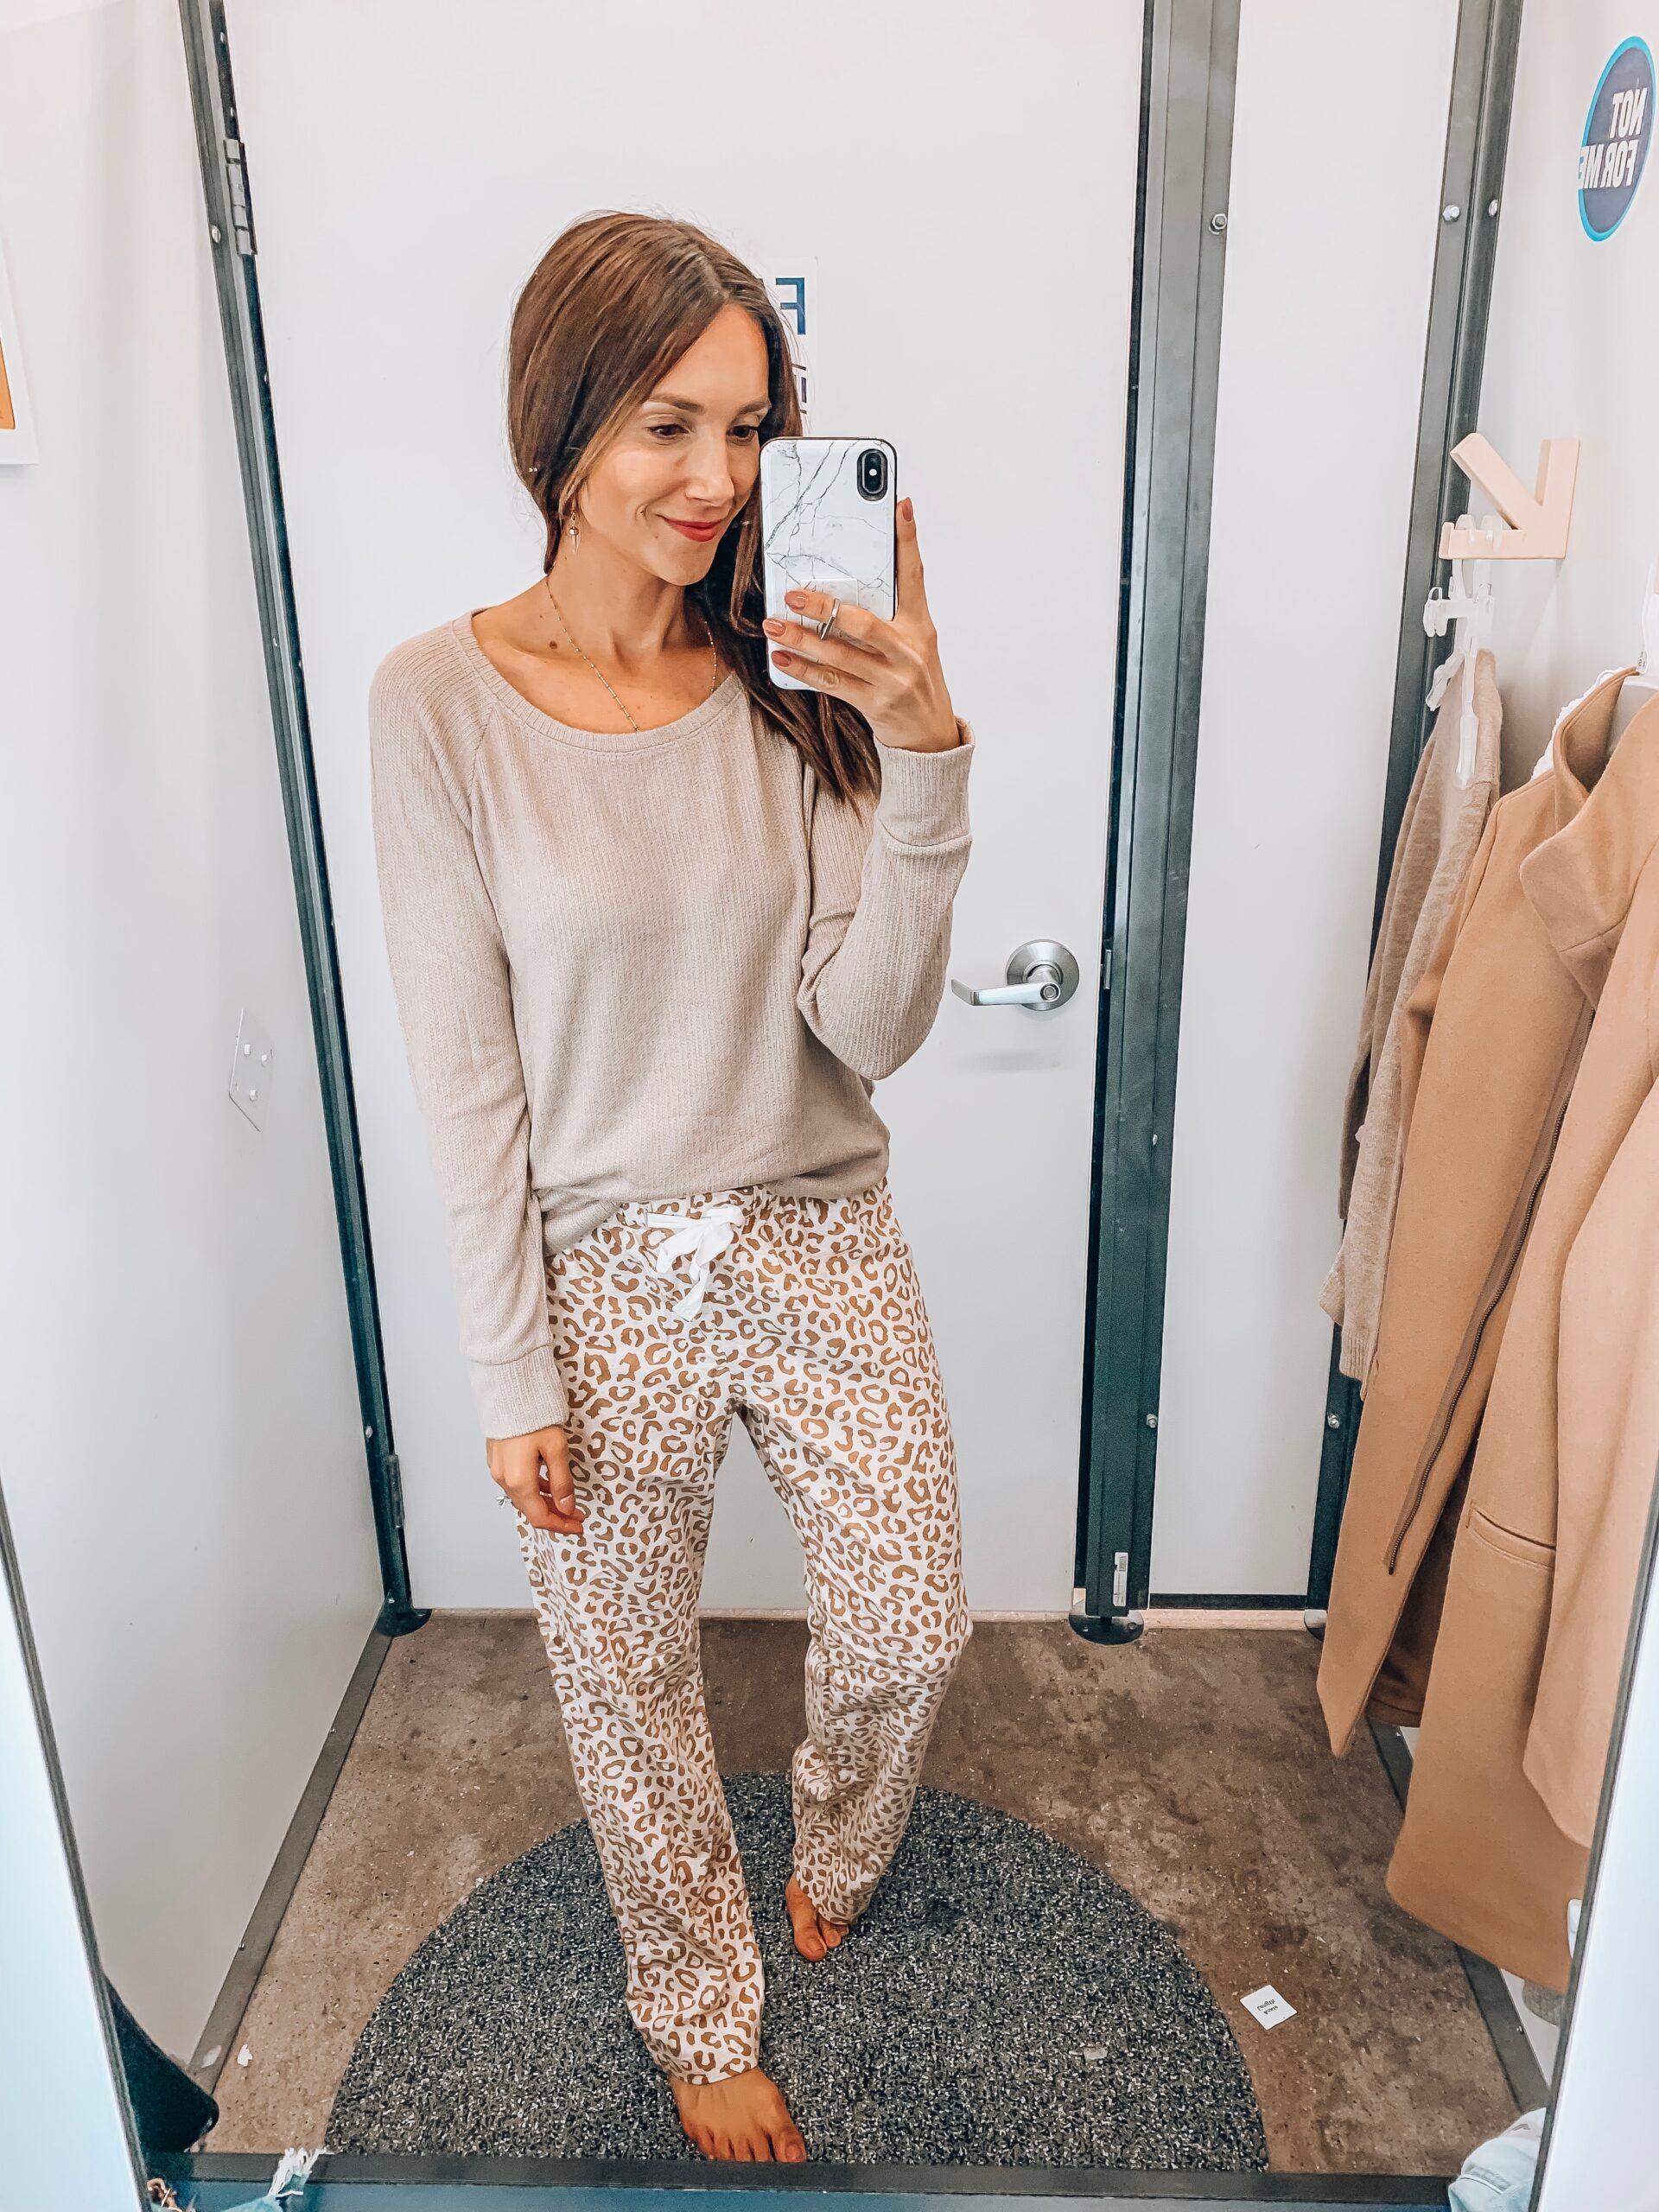 cozy loungewear, pj bottoms, thermal